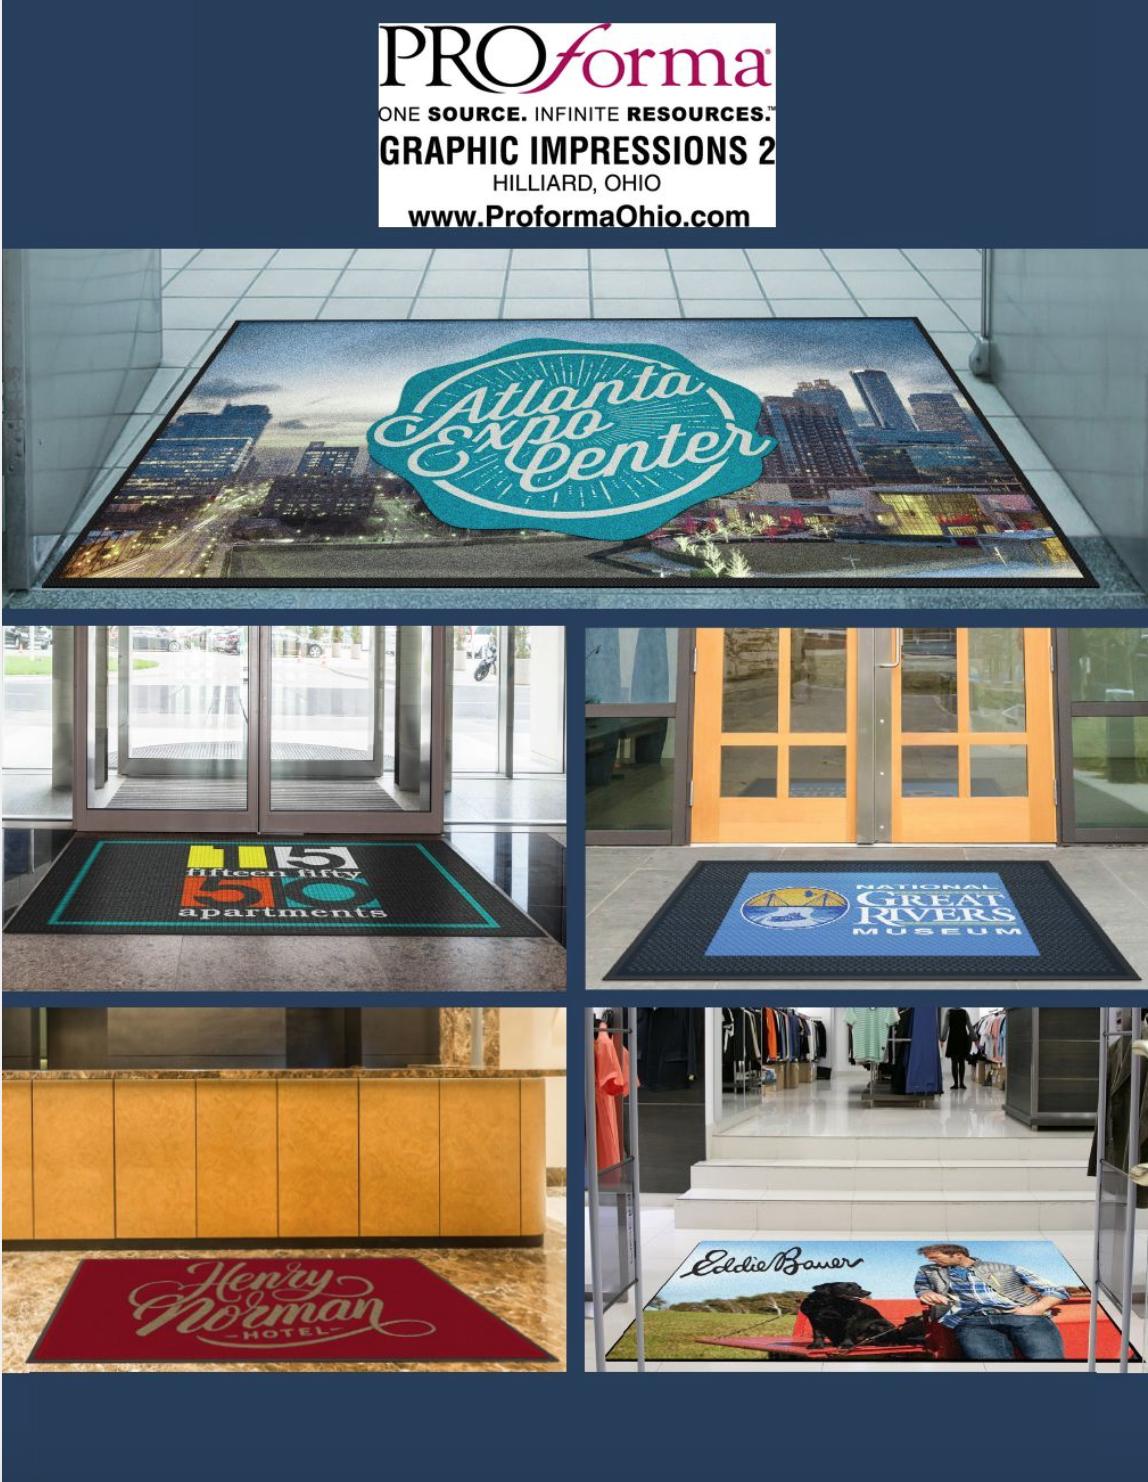 Banners for Tradeshows in Hilliard, Ohio